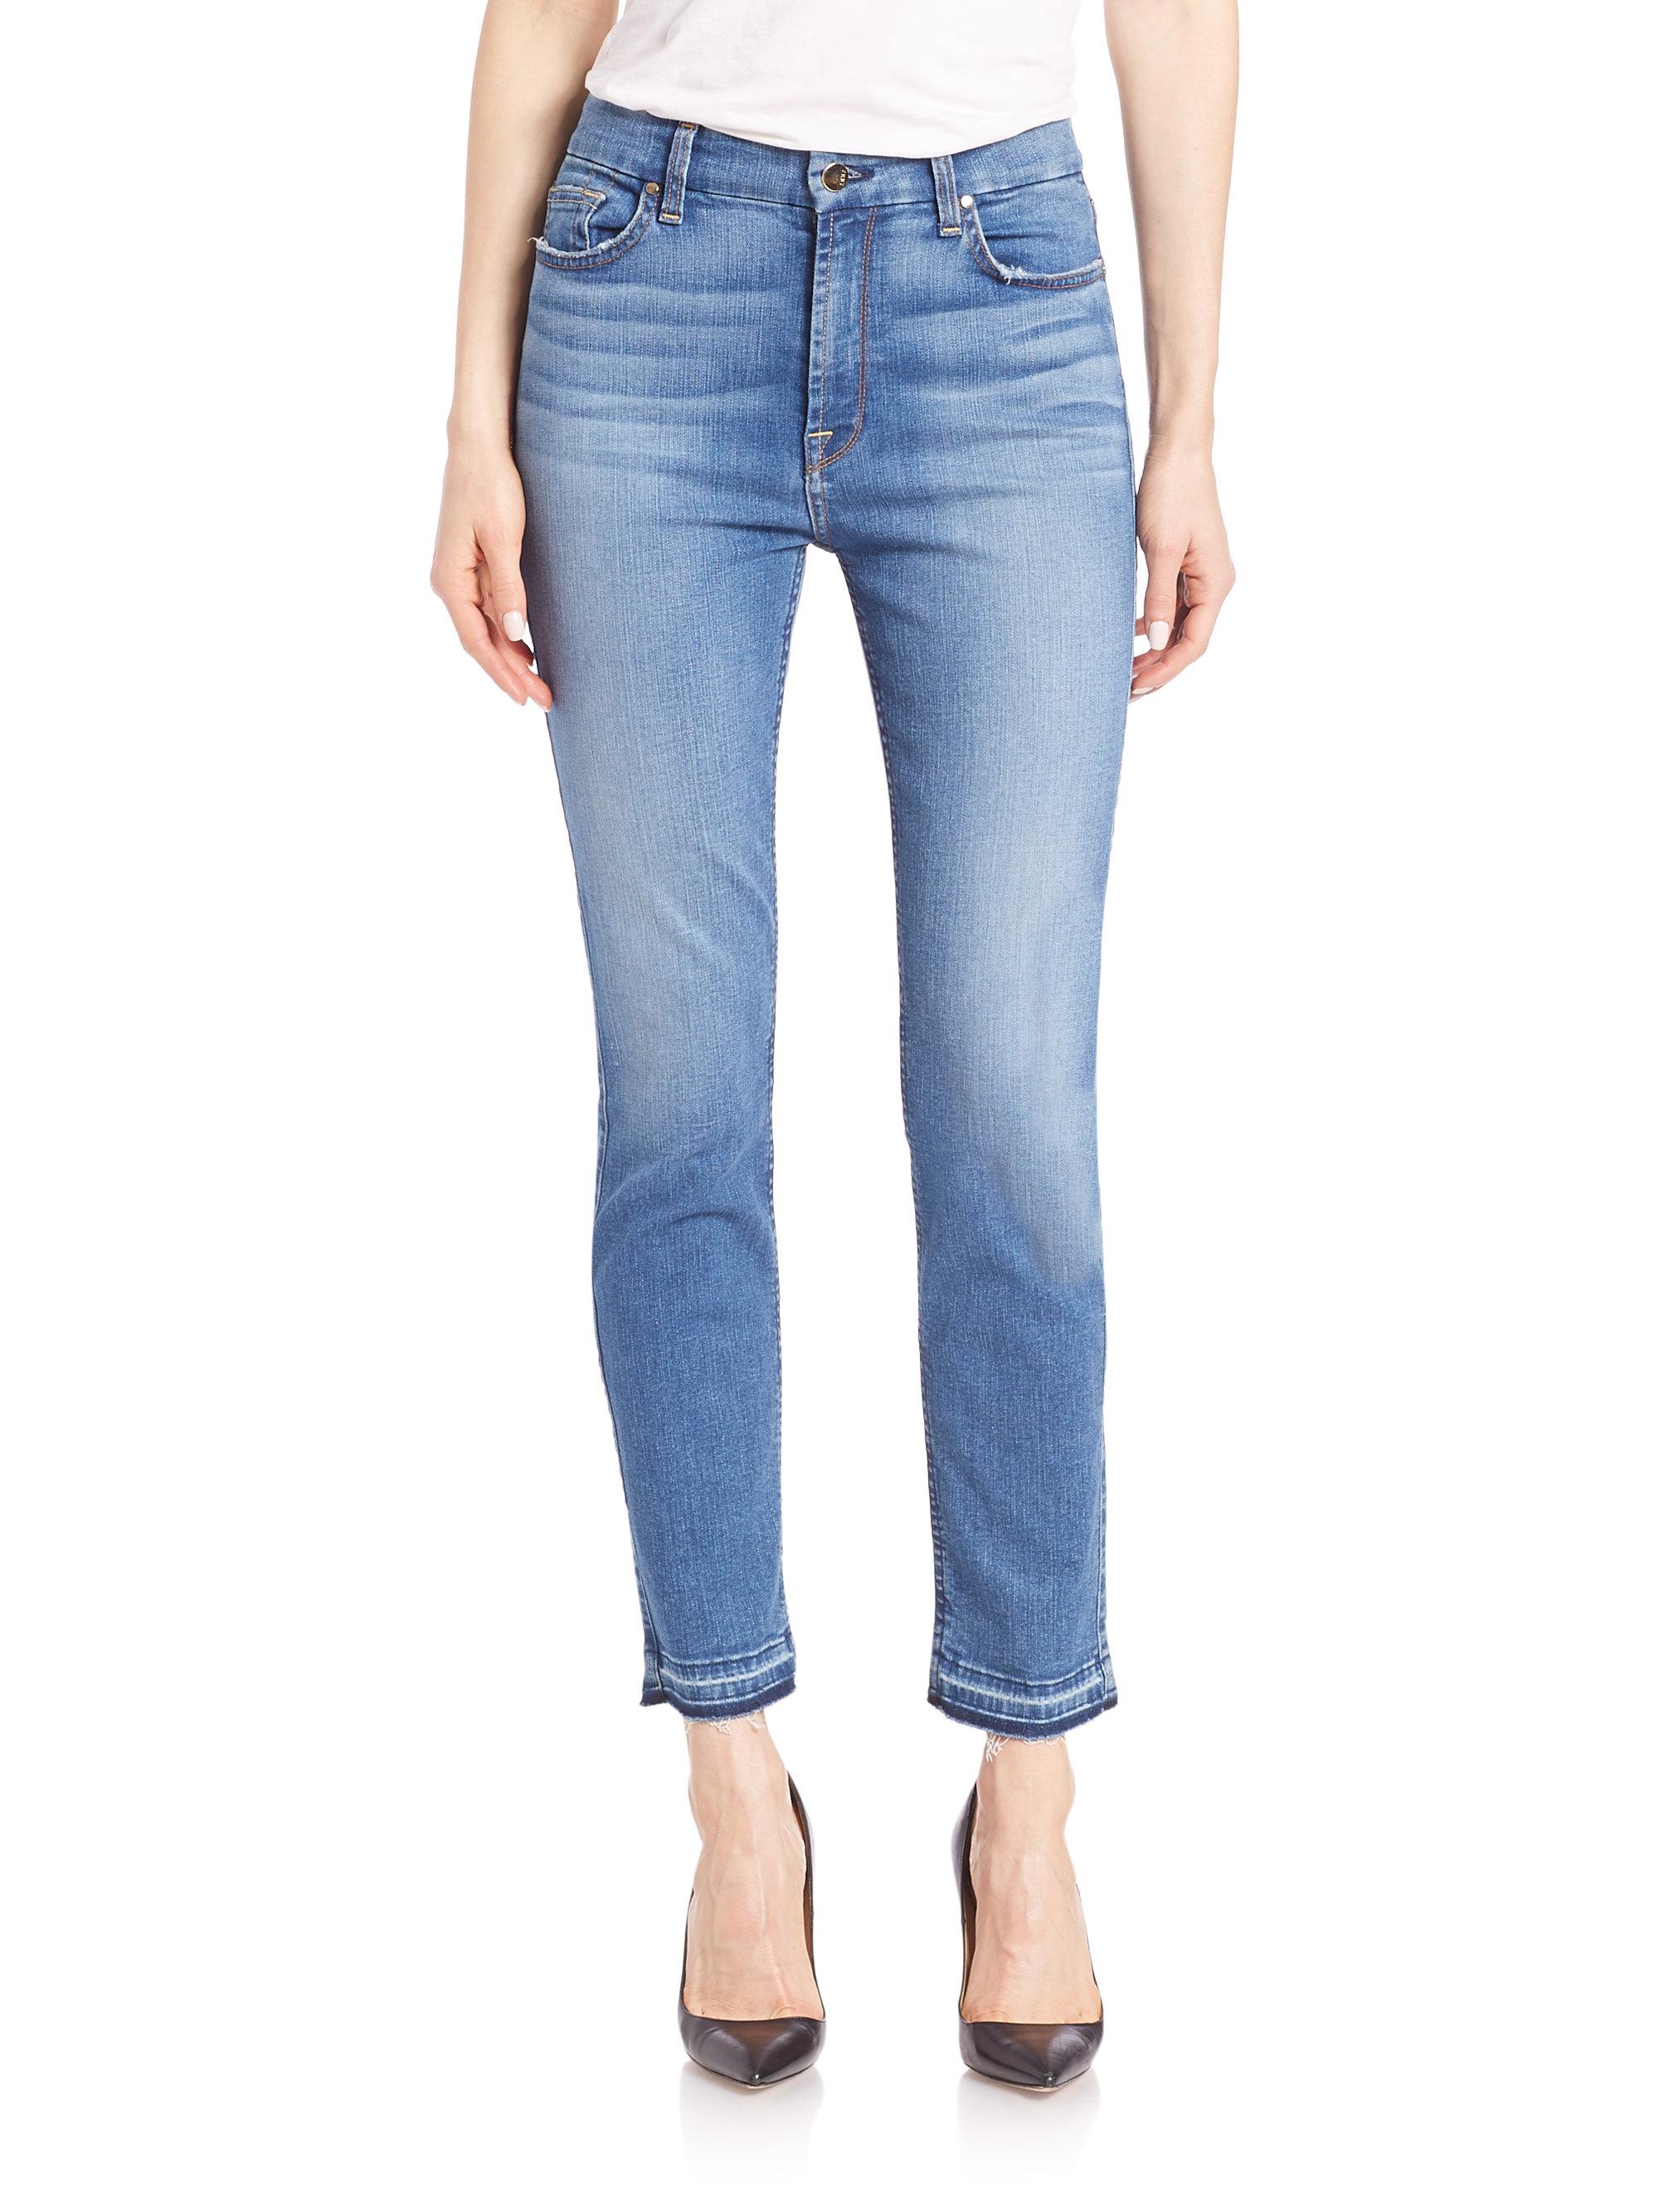 Jen7 Frayed Hem Ankle Skinny Jeans in Blue